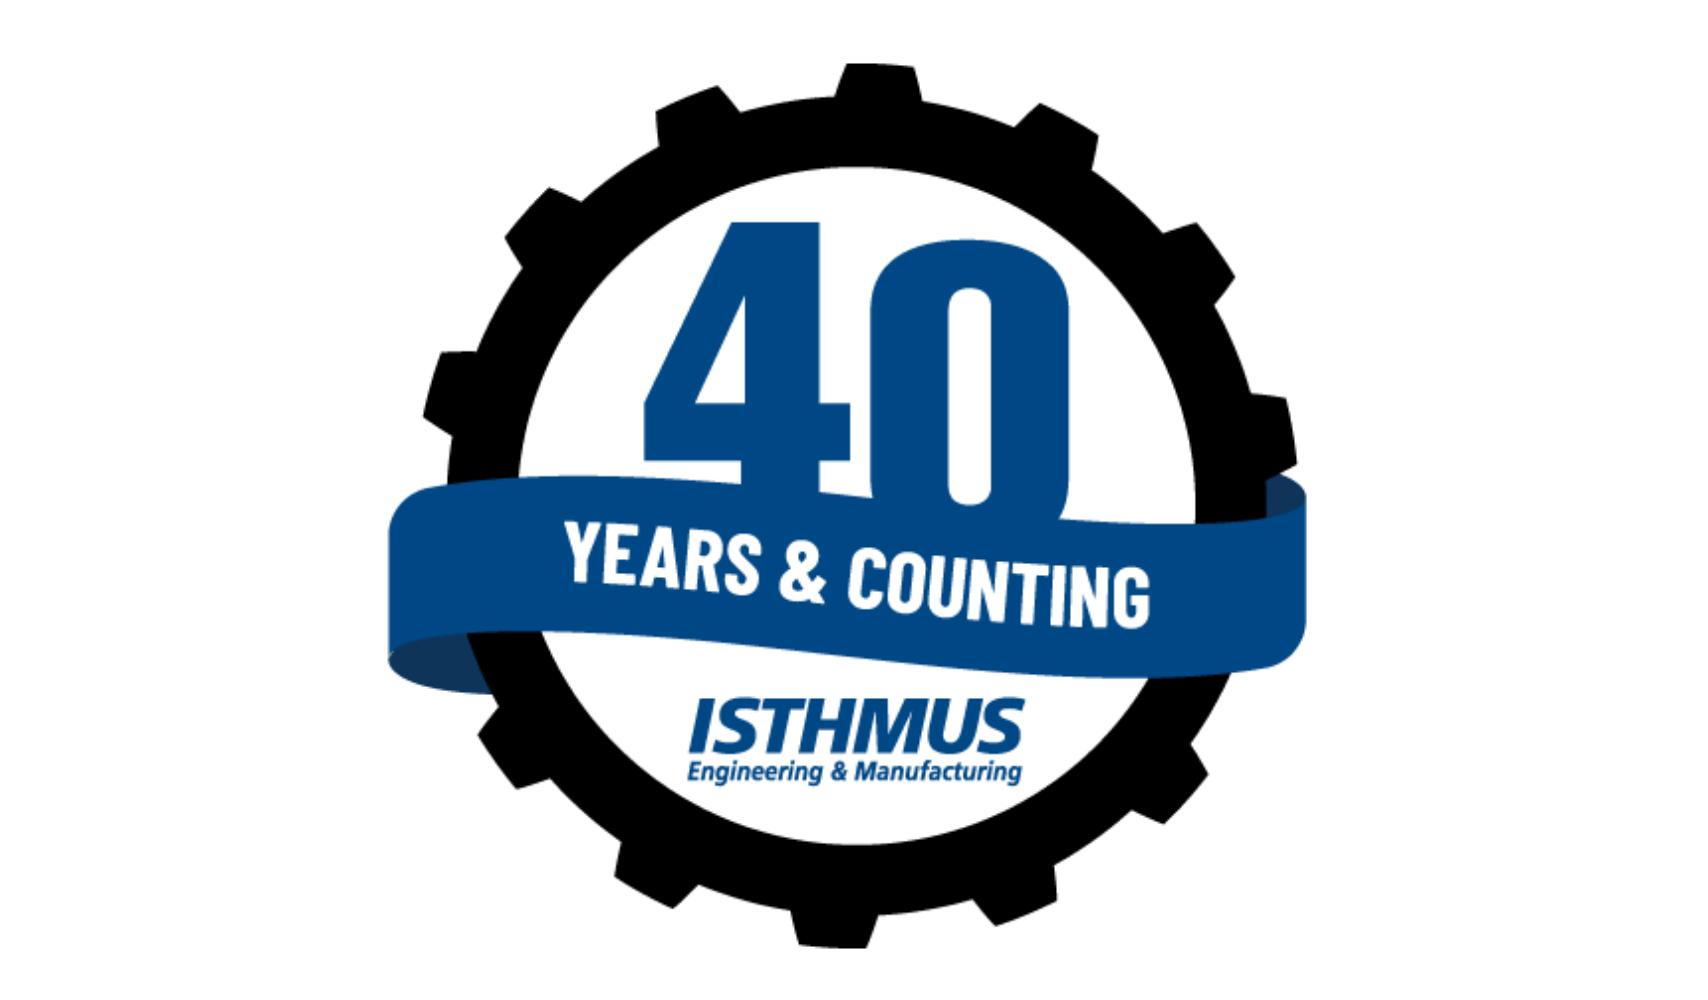 Isthmus Celebrates 40 Years